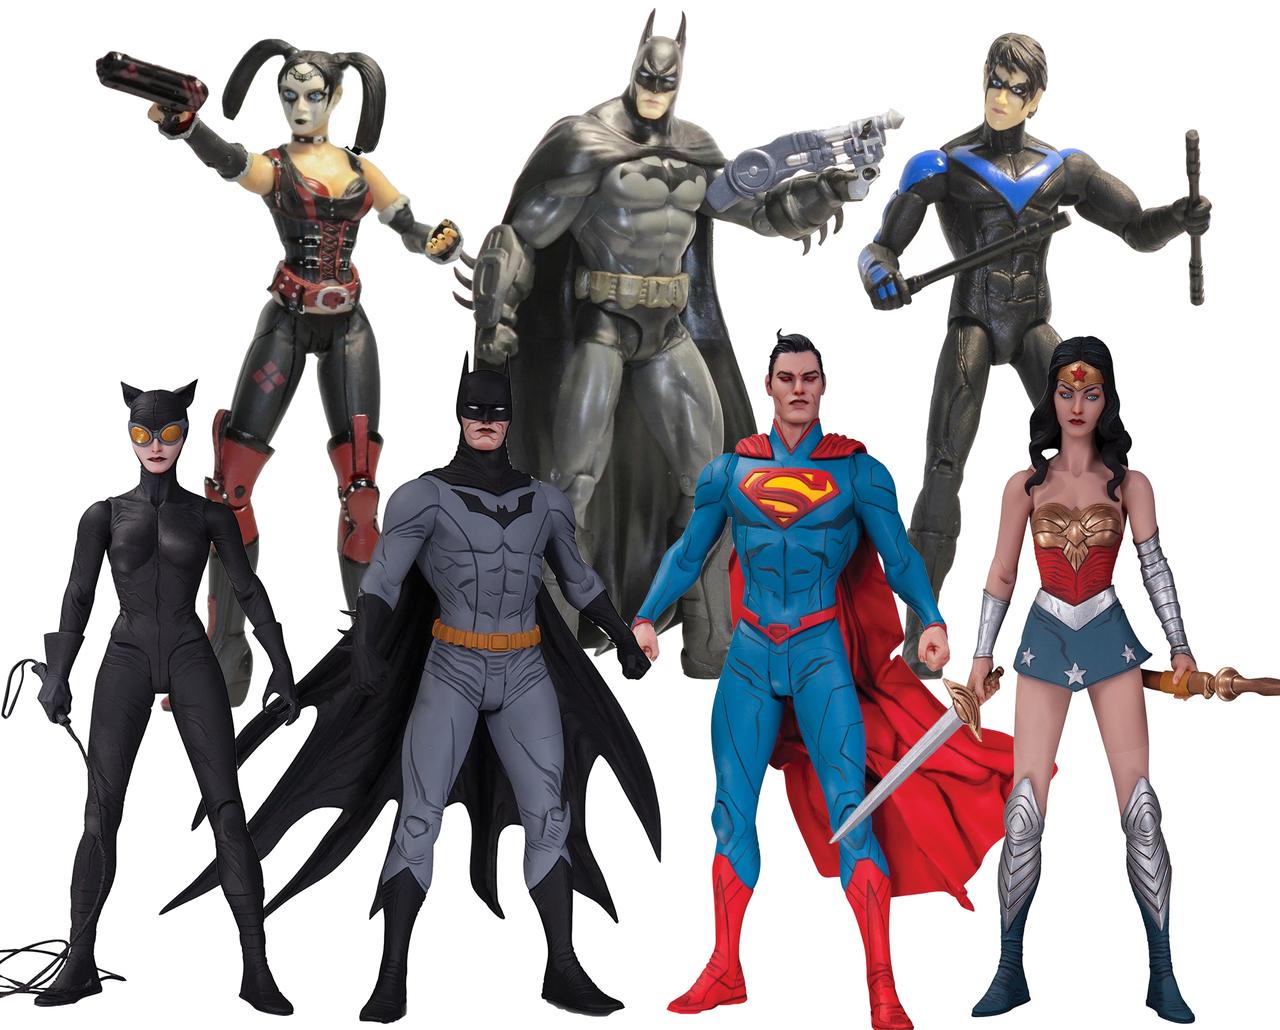 Набор фигурок DC Comics, Лига Справедливости + Аркхэм сити, 17 см - Justice League & Arkham City, by Jae Lee